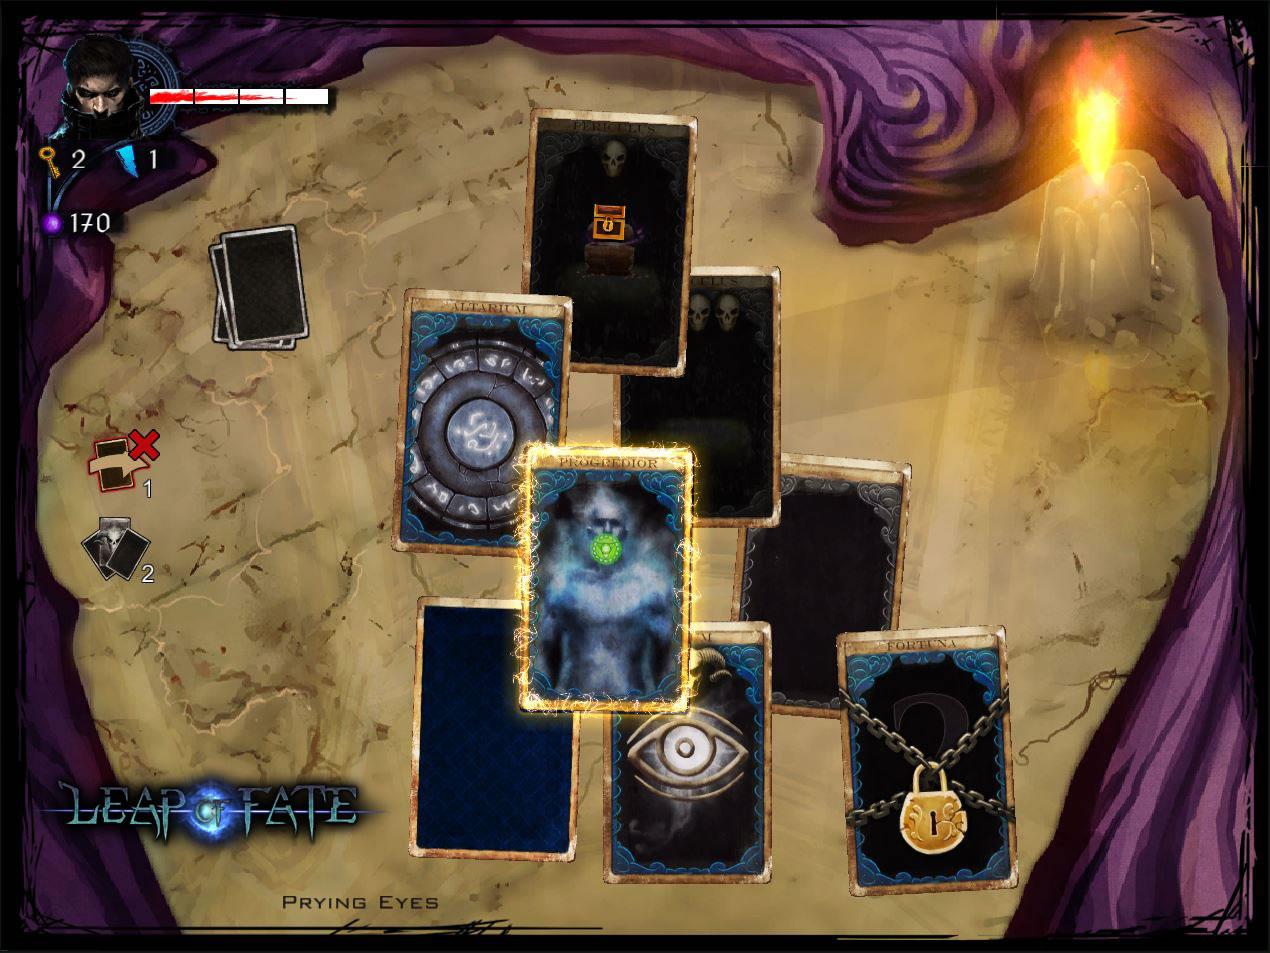 Leap of Fate Review Screenshot 1